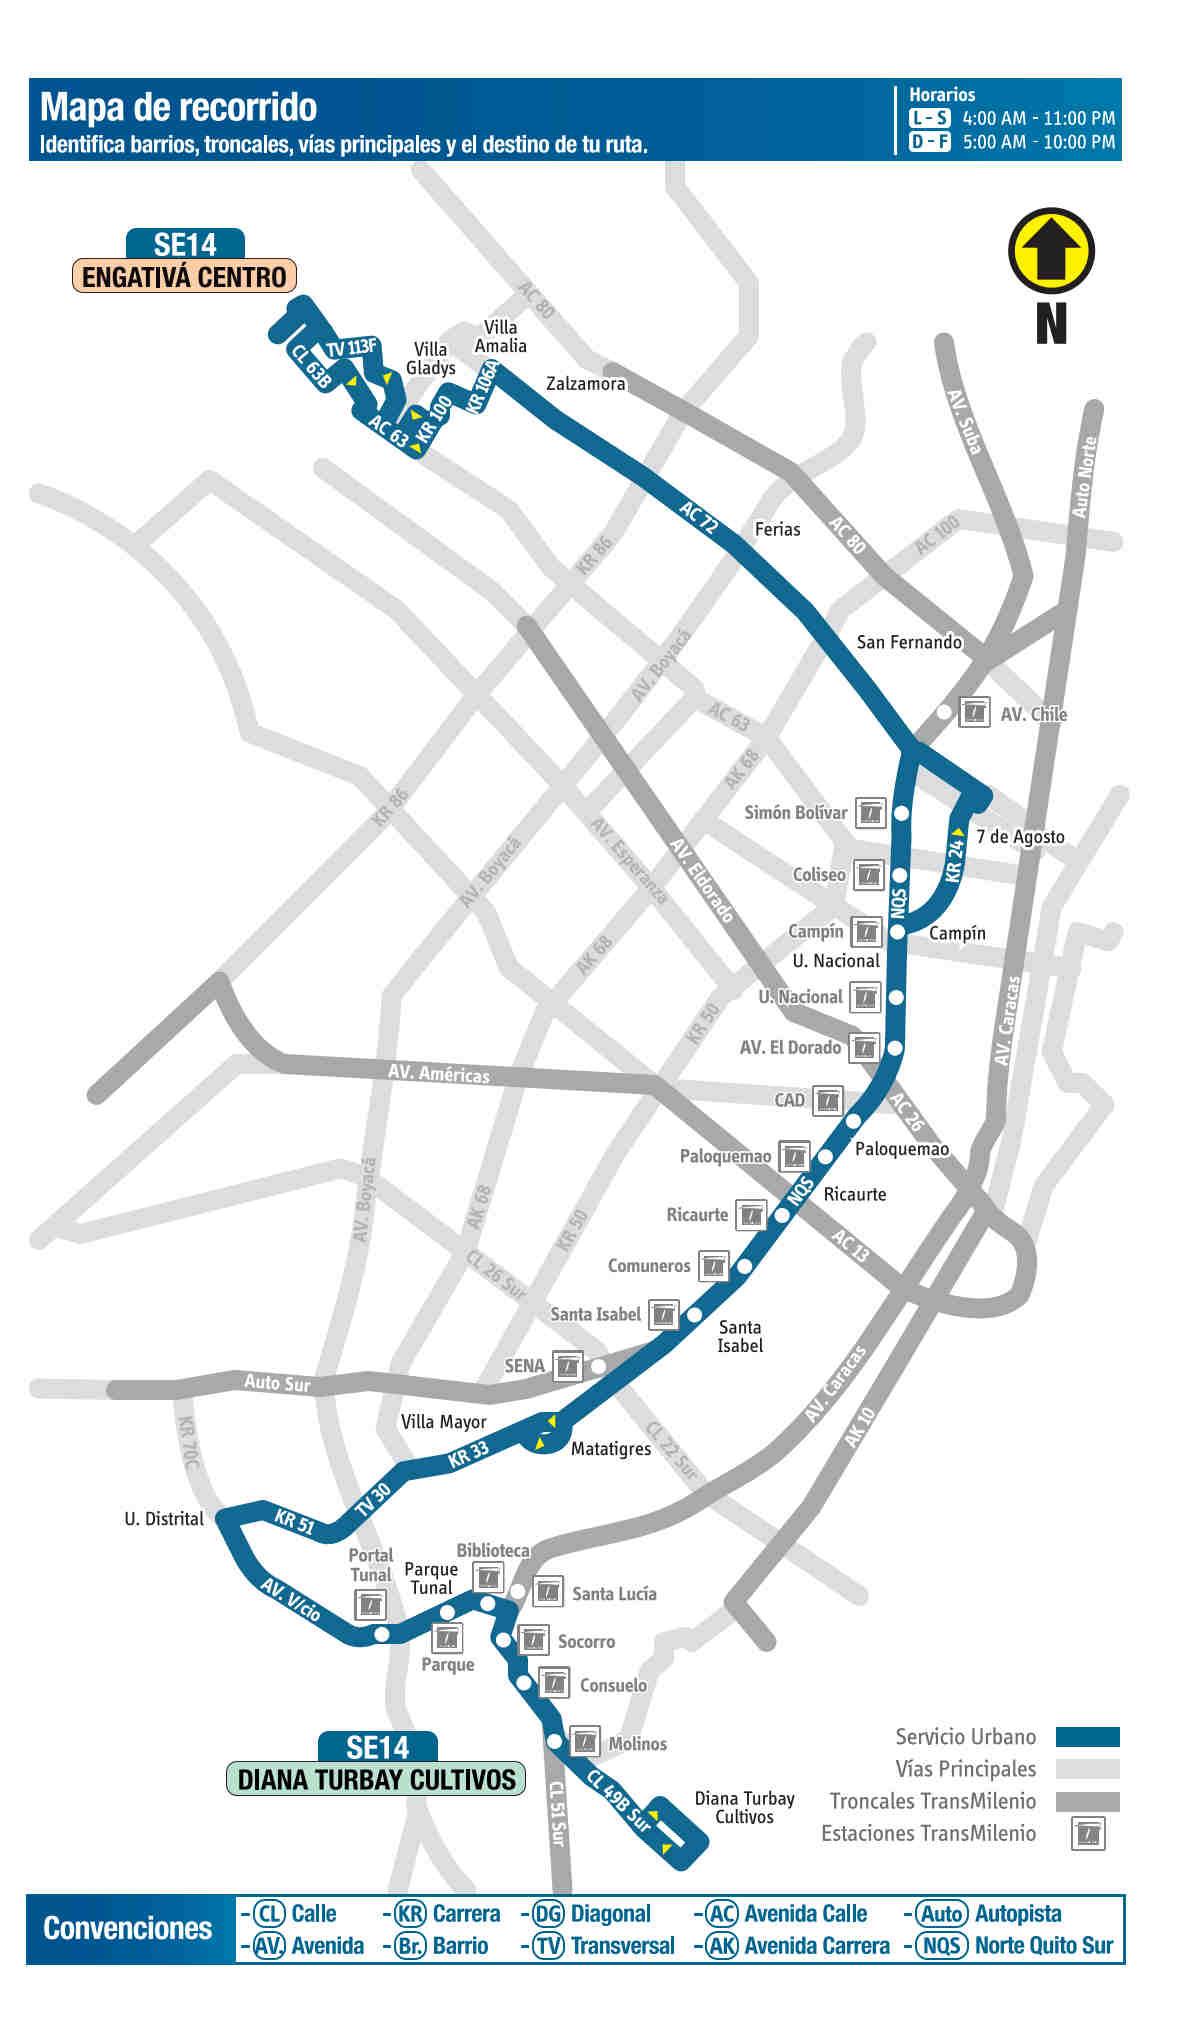 SE14 Diana Turbay Cultivos - Engativá Centro, mapa bus urbano Bogotá